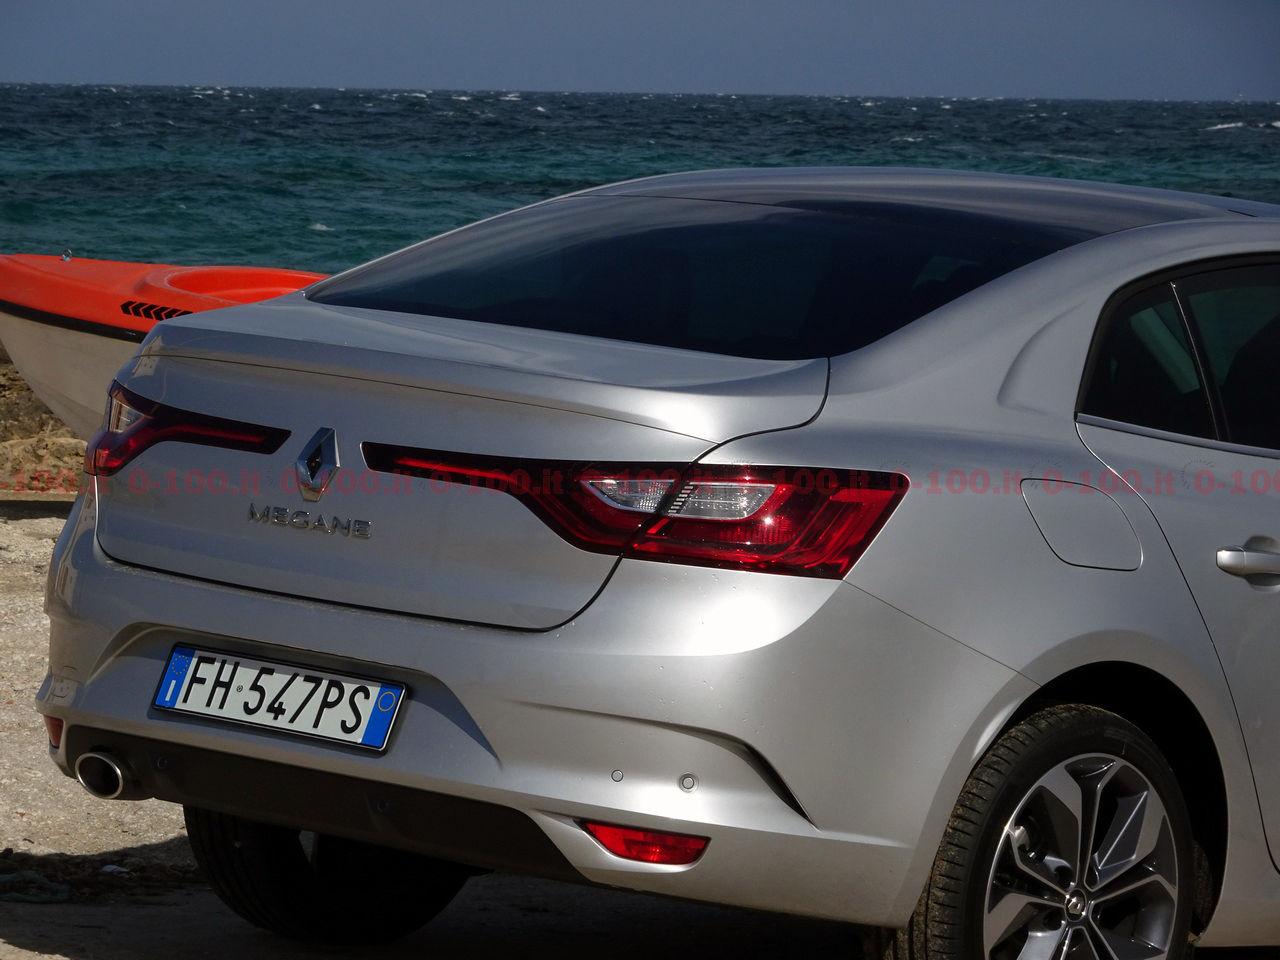 renault-megane-grand-coupe-dci-110-130-cv-test-prova-impressioni_0-100_14